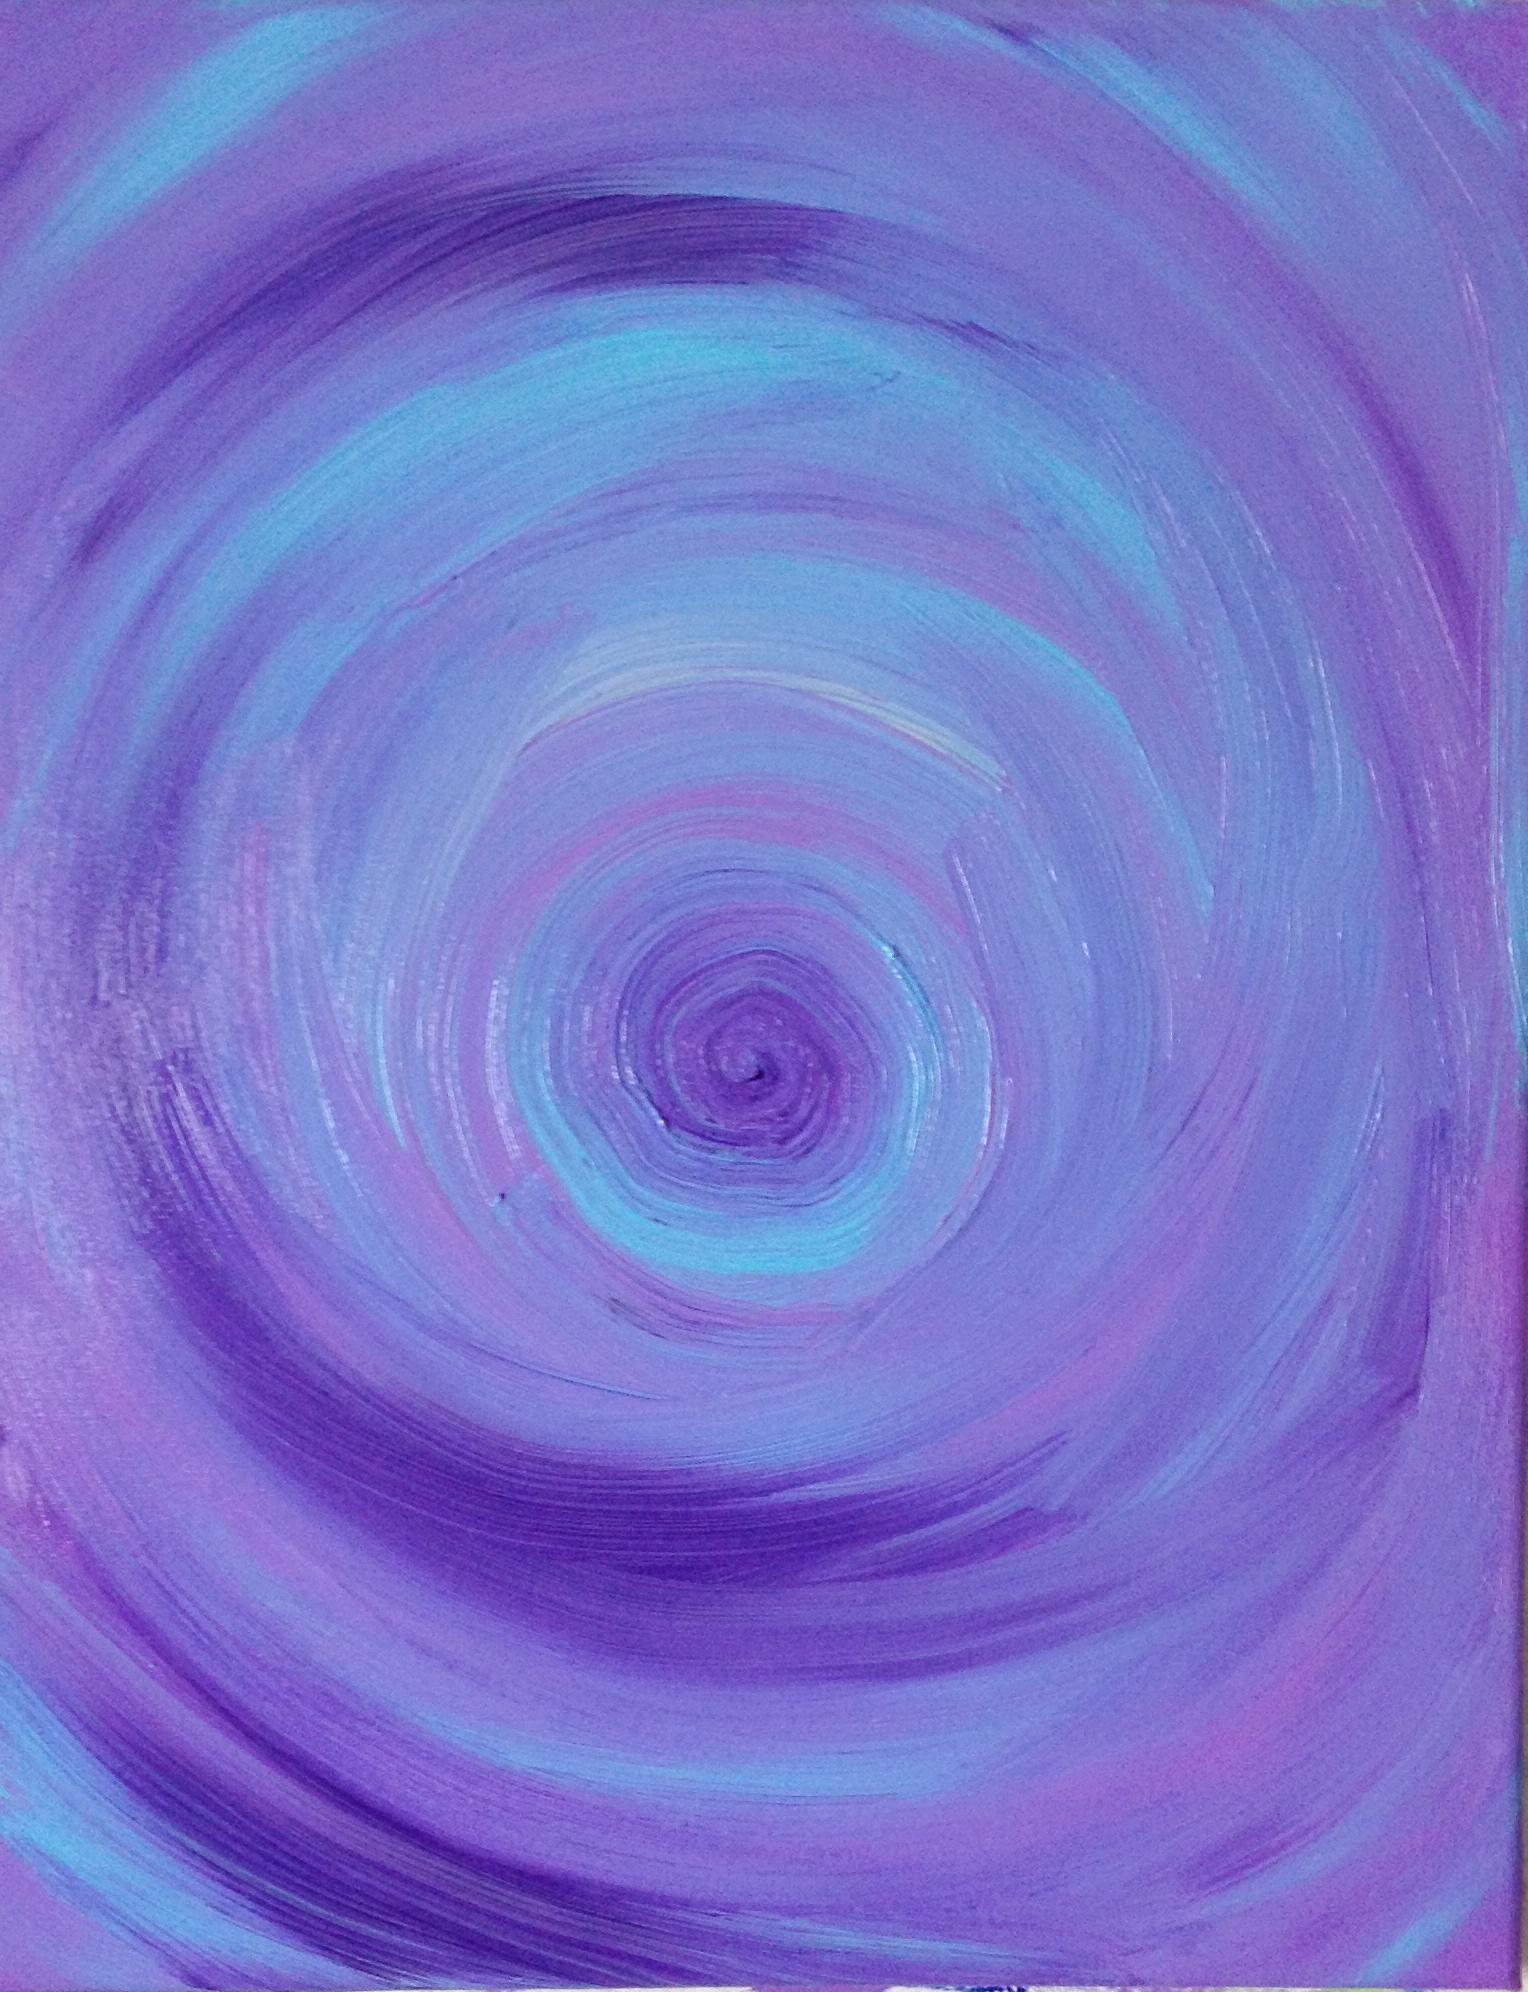 untitled (blue), acrylic on canvas, 16''x20'', 2013